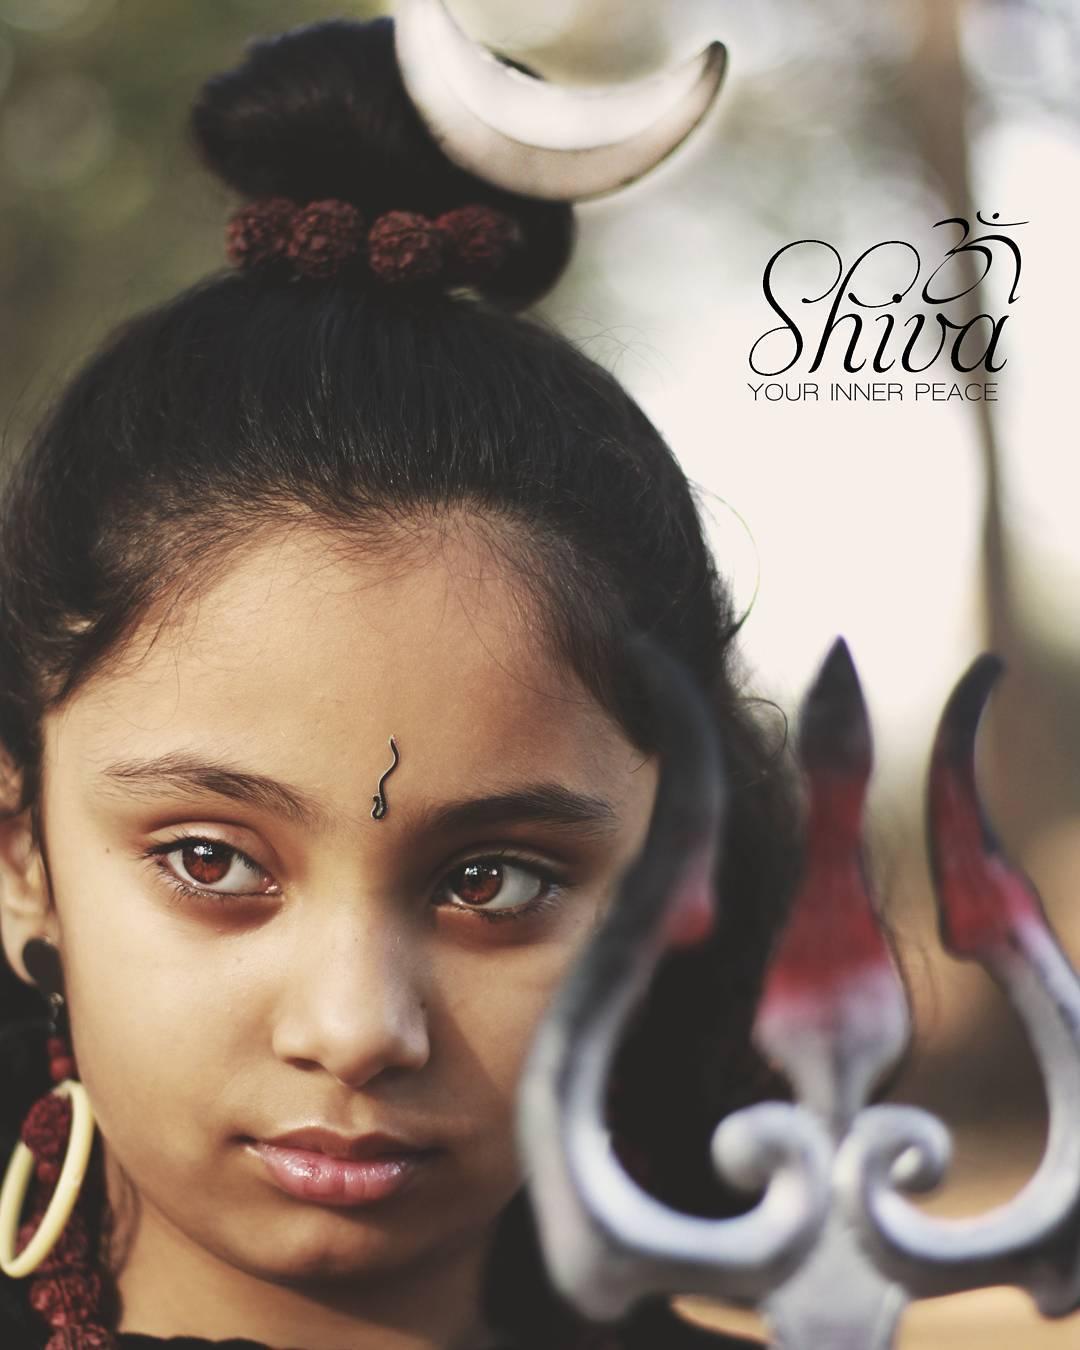 Ohm Shiva | Your inner Peace. Featuring : Helly  Maha Shivratri Concept Shoot  #om #ohmShiva #omshiv #omshiva #Shivratri #LordShiva #festival #India #gujaratifestivals #shivlord #conceptphotoshoot #photography #kidsphotography #kidsshoot #picofday #photography #photooftheday #photographerslife #instagram #instagramgood #_indiasb